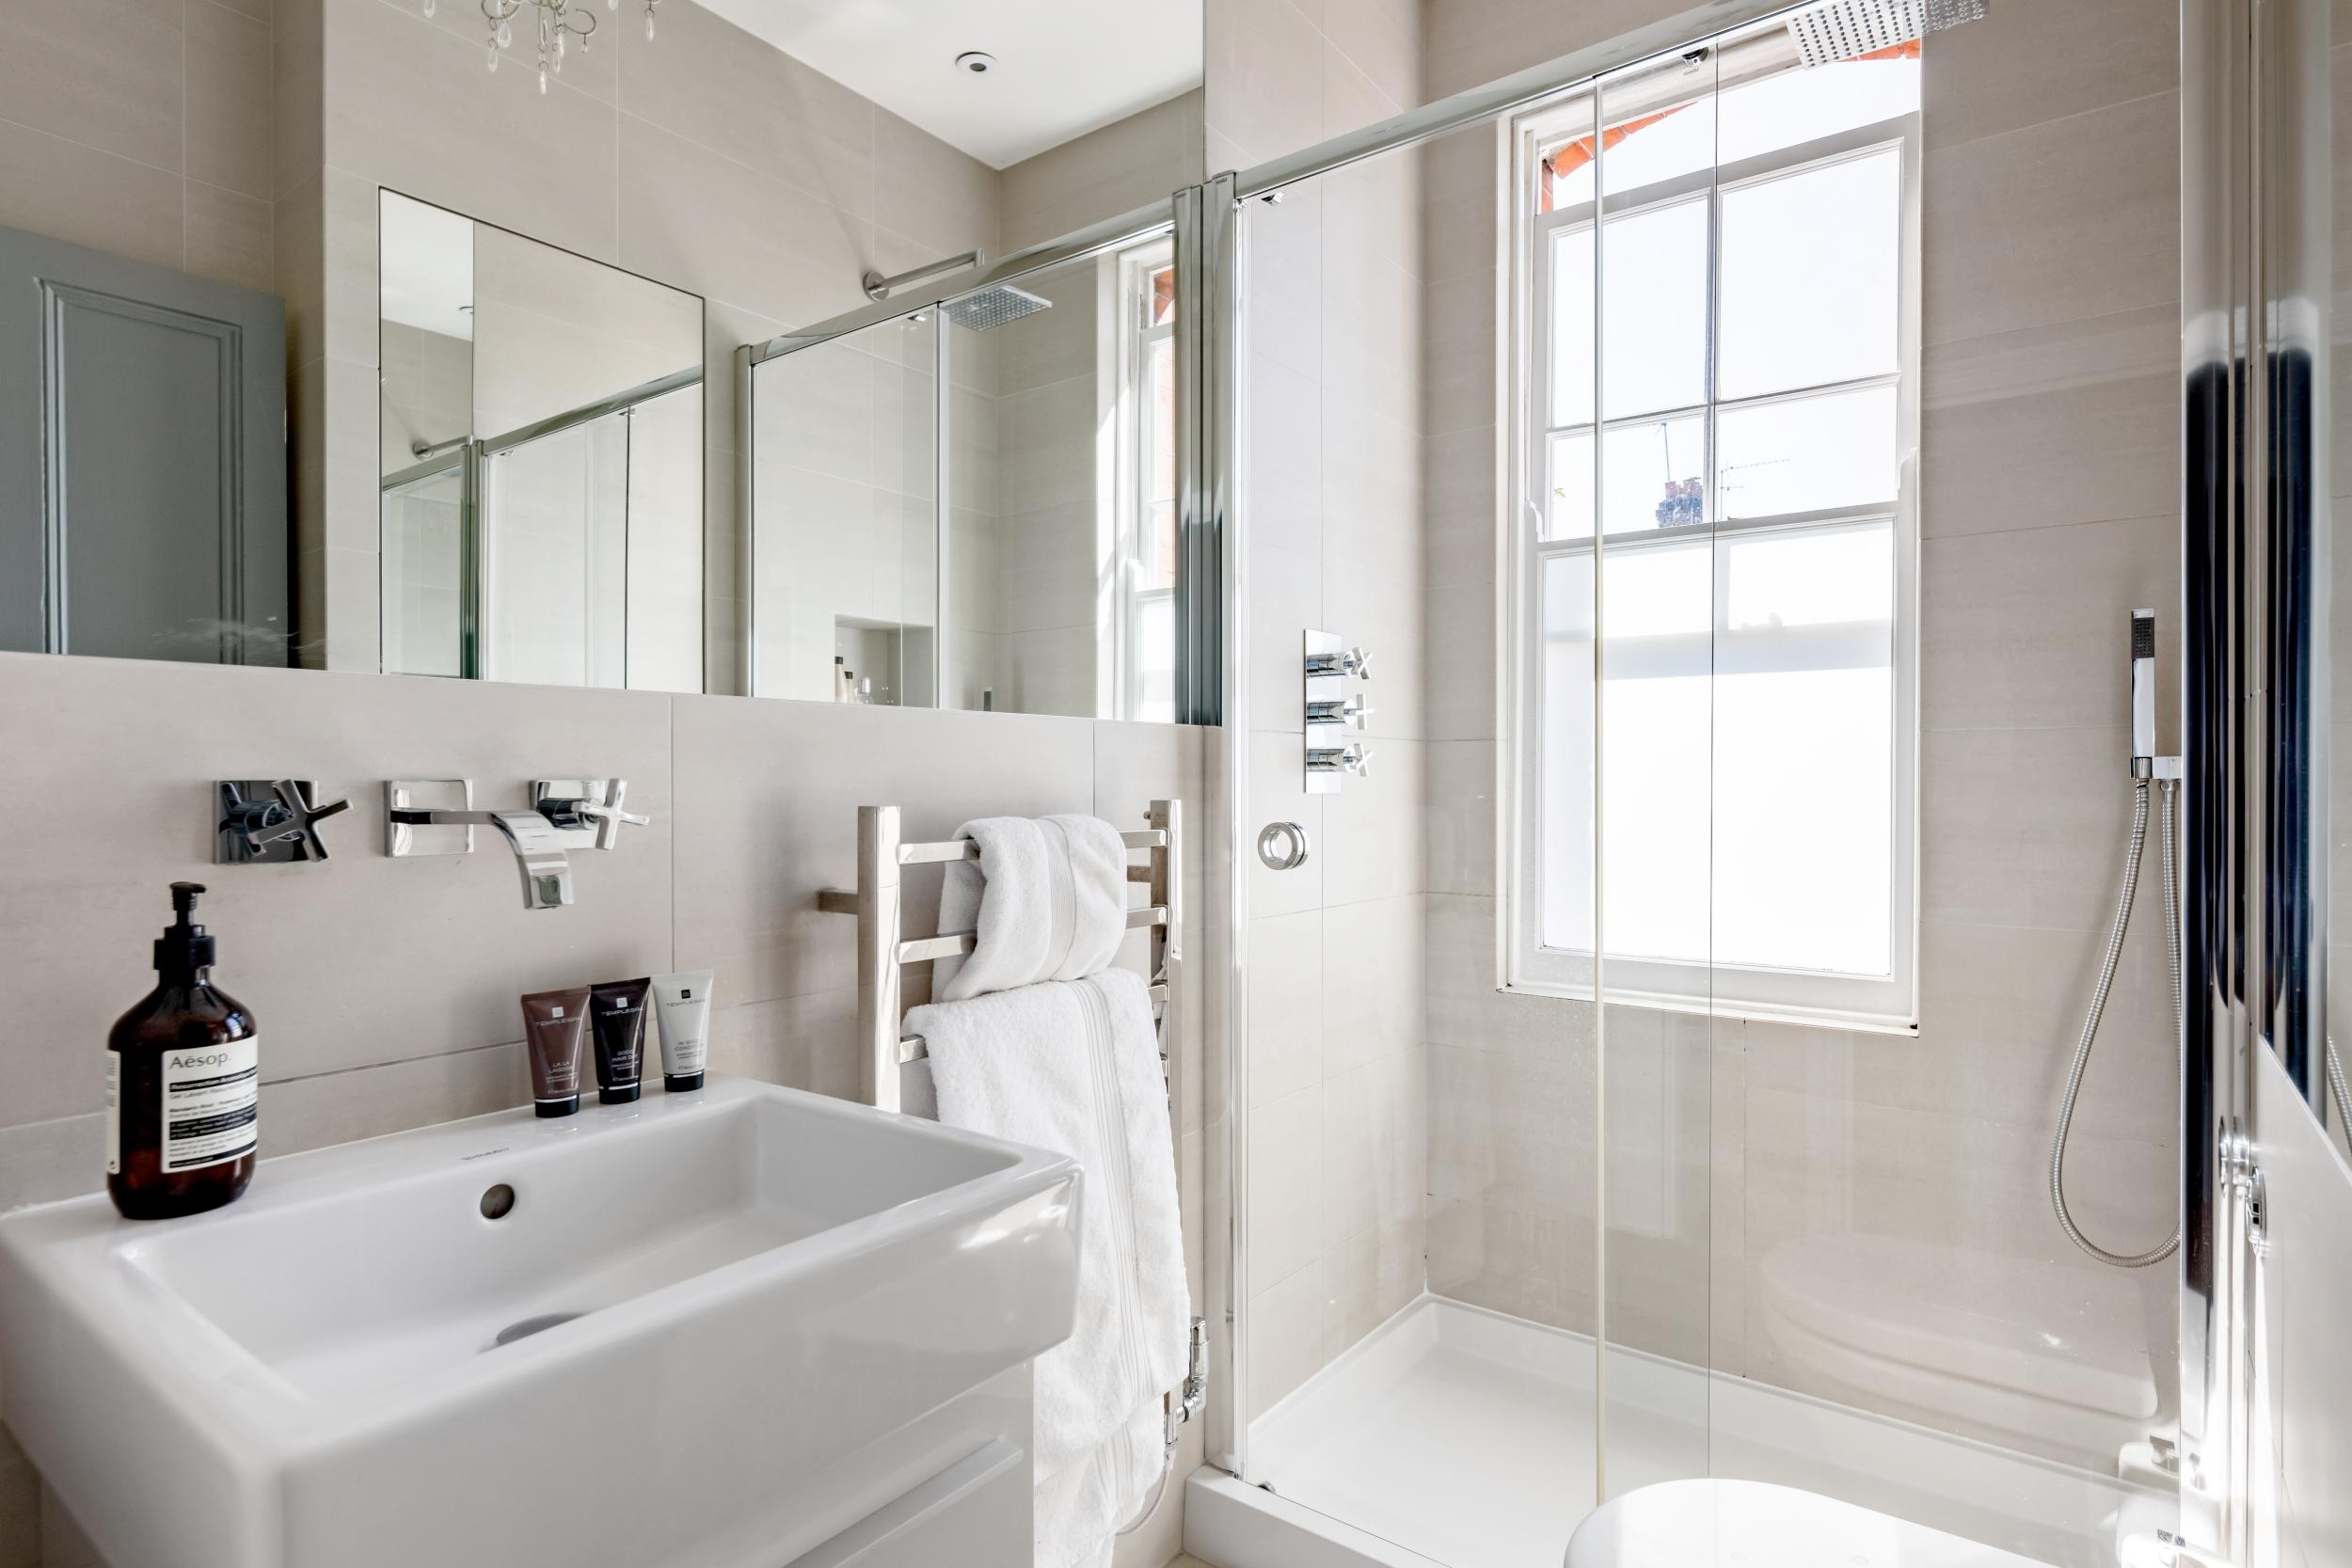 санузел душ раковина окно